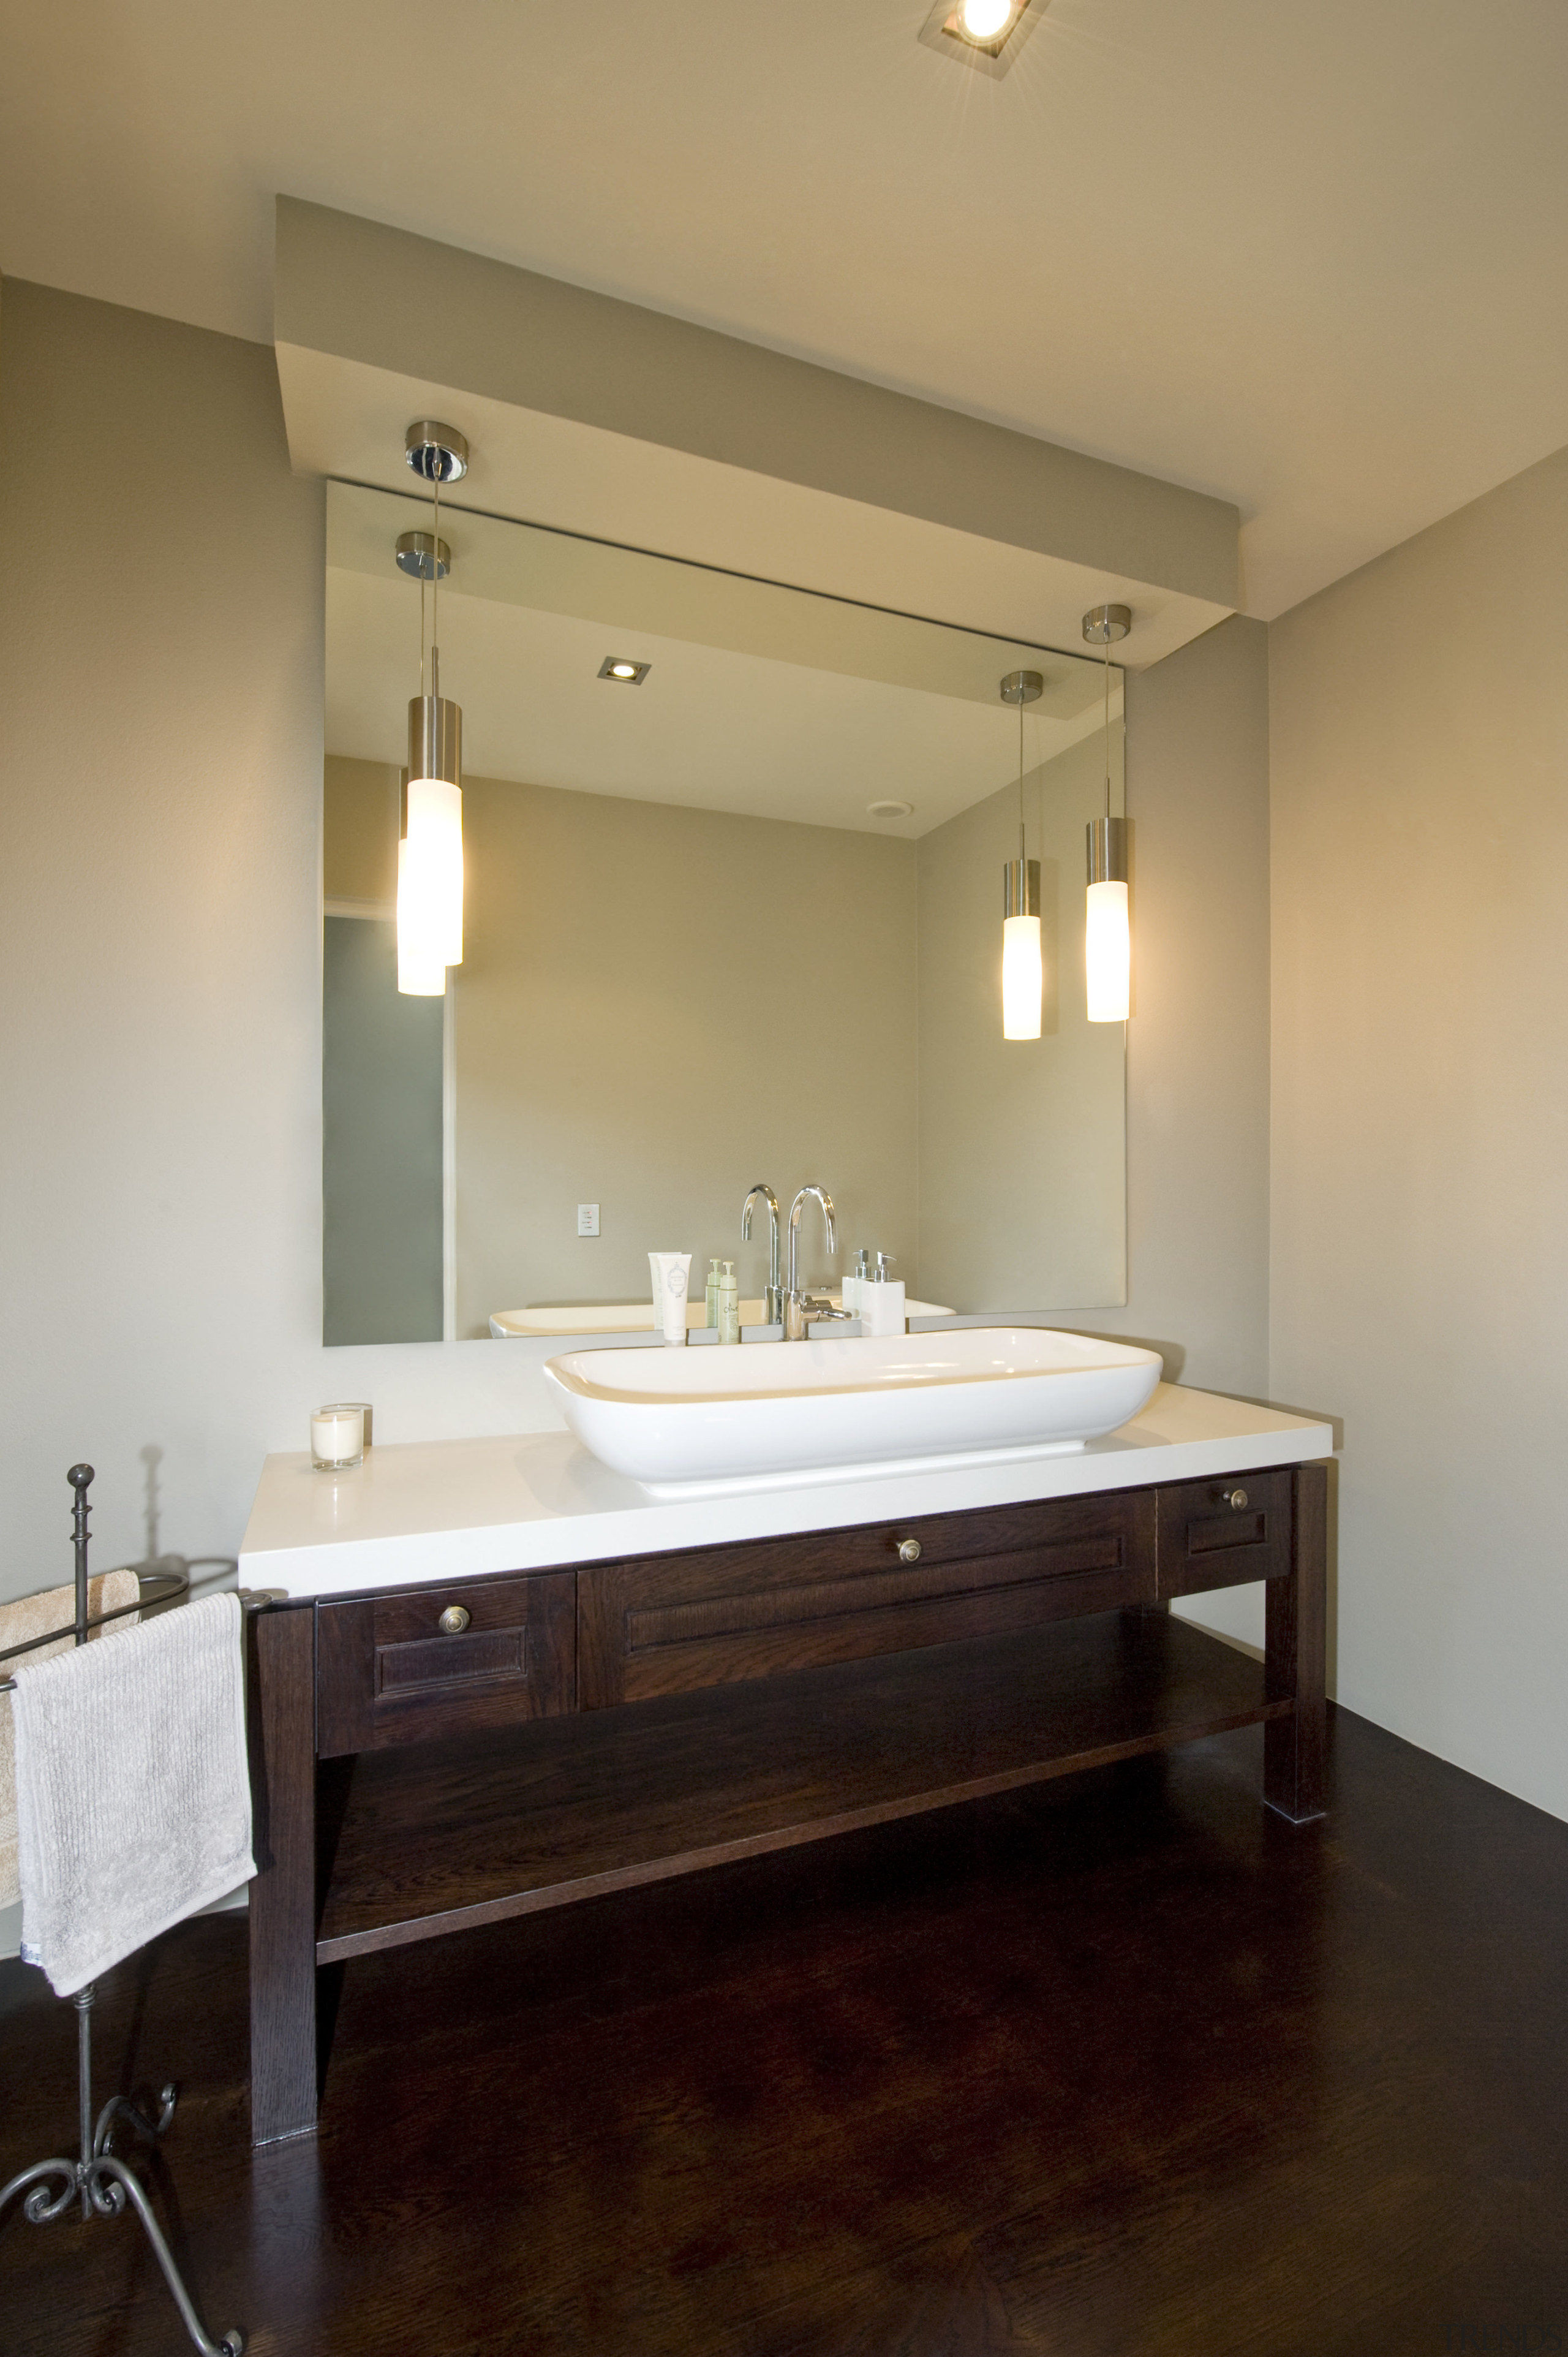 Image of the bathroom which the vanities have bathroom, ceiling, floor, flooring, interior design, lighting, room, sink, orange, black